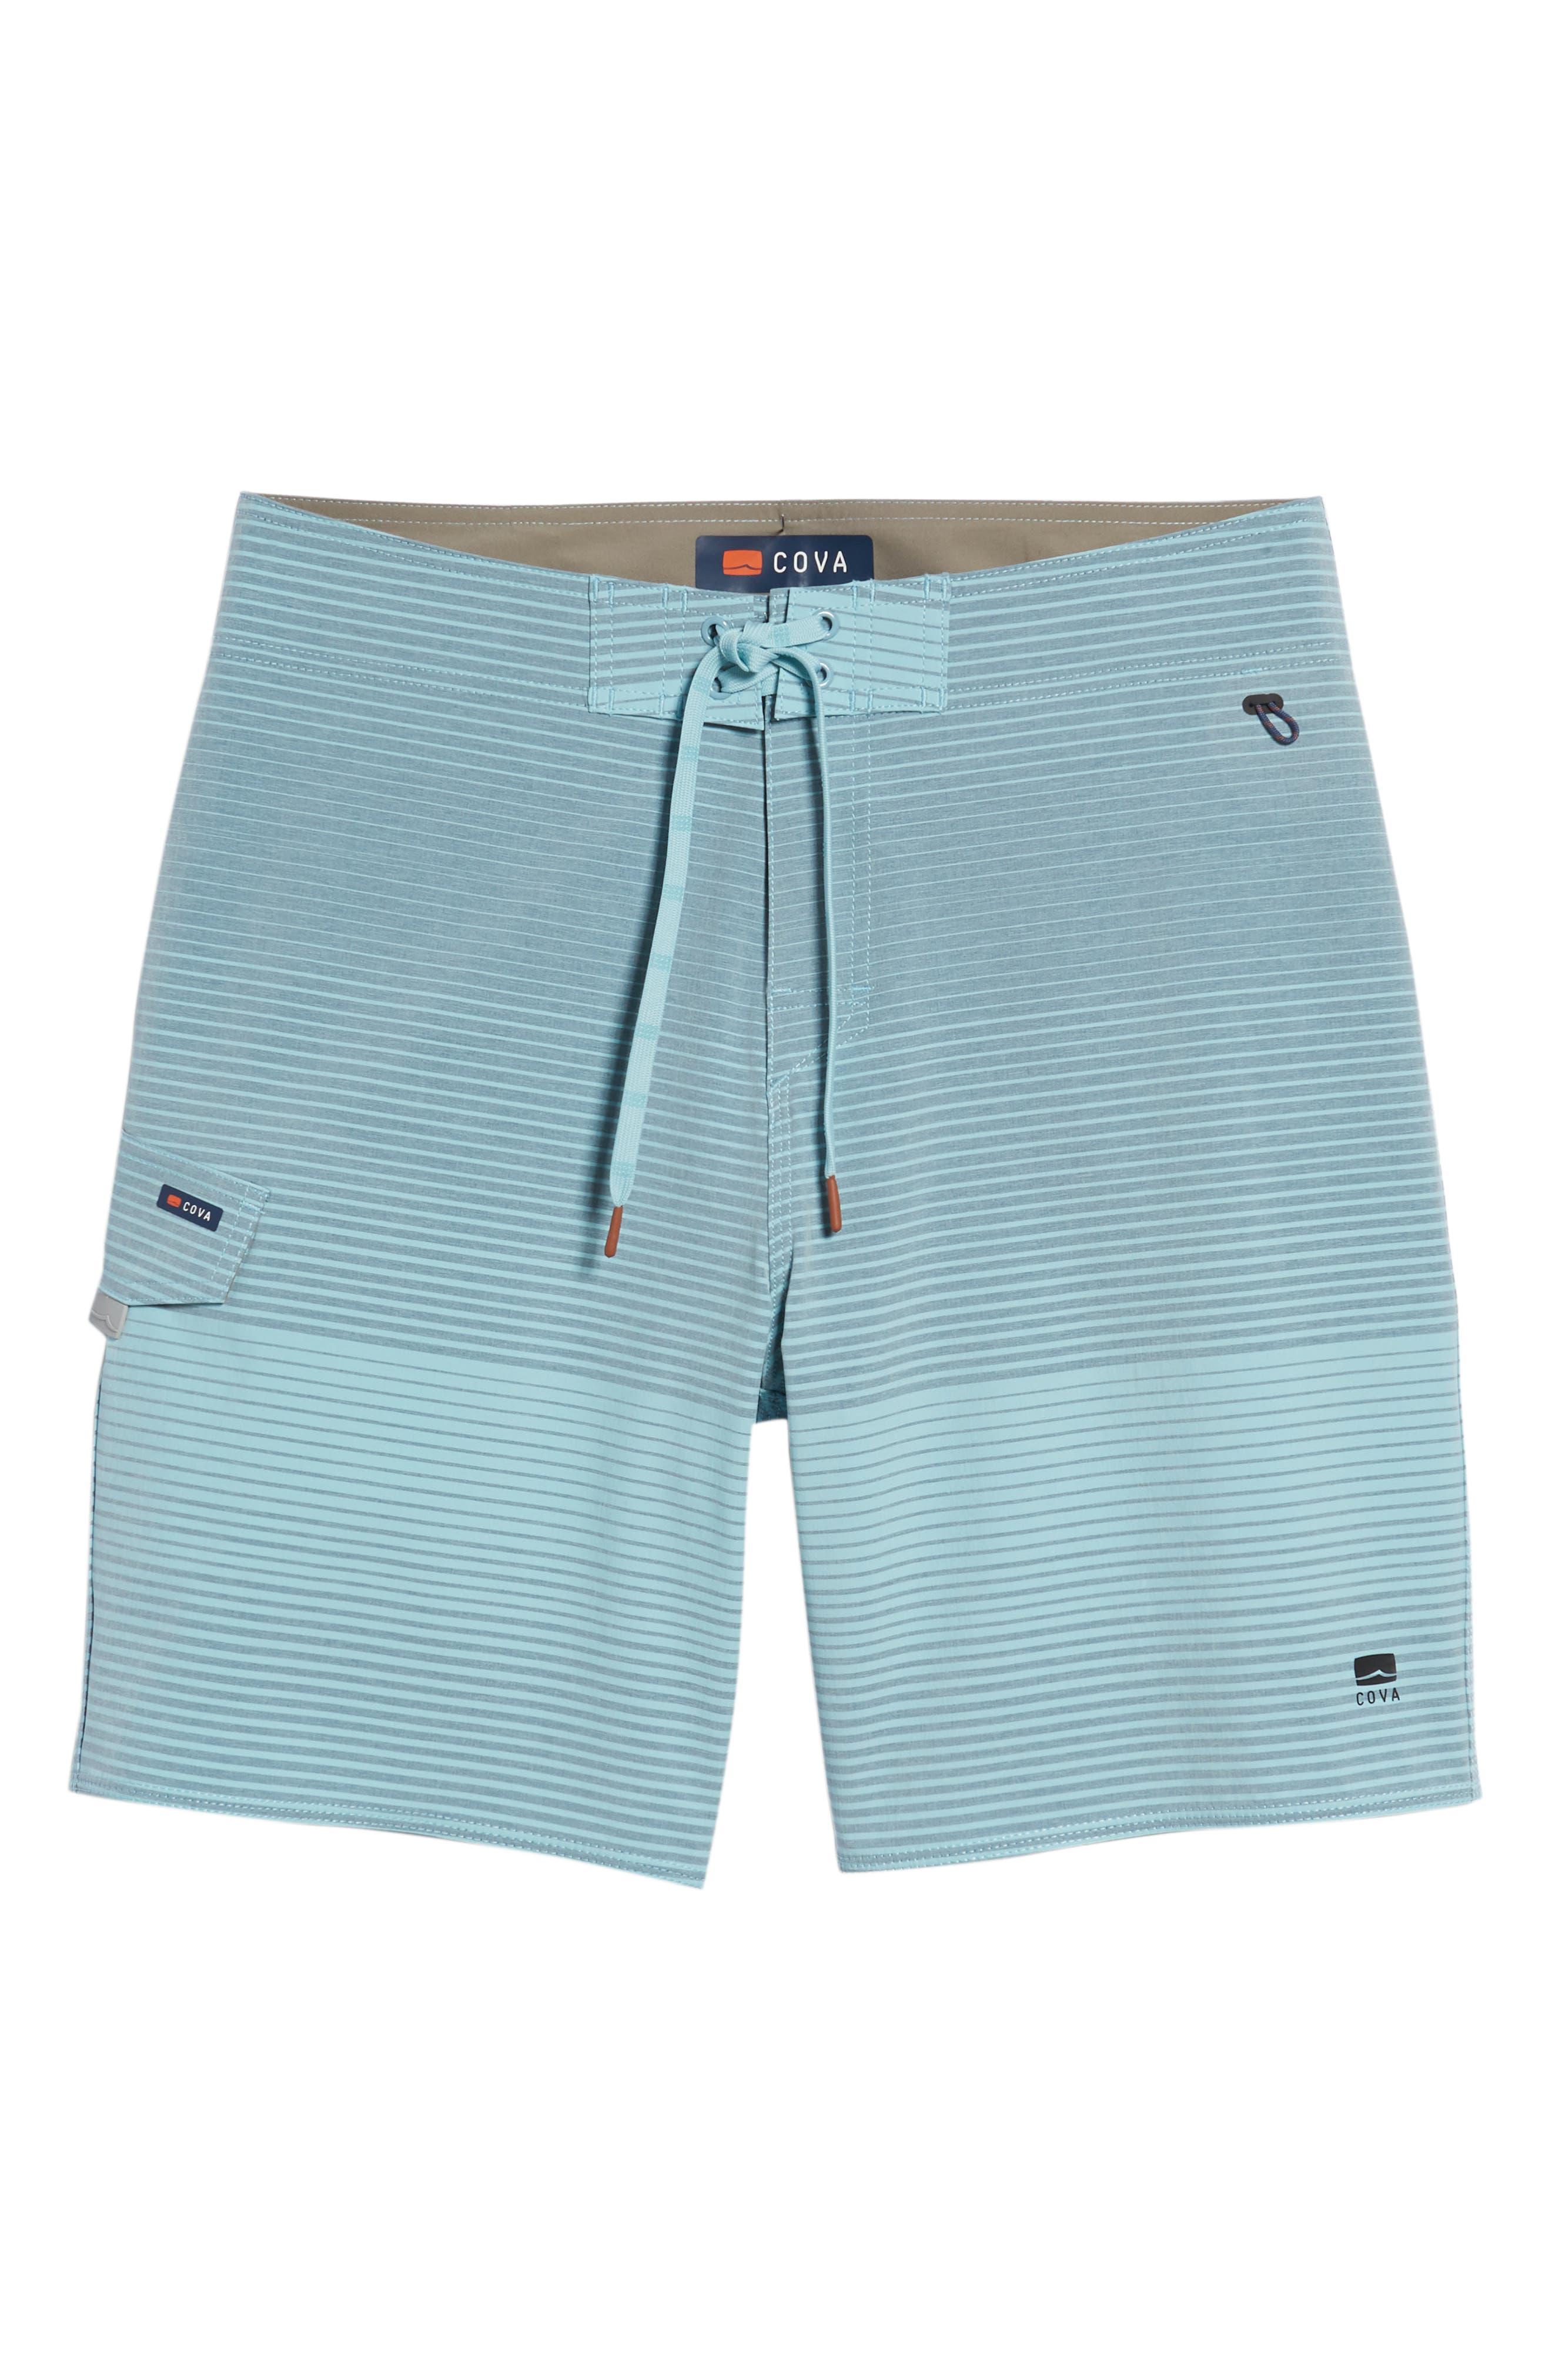 Beachcomber Board Shorts,                             Alternate thumbnail 6, color,                             CHARCOAL